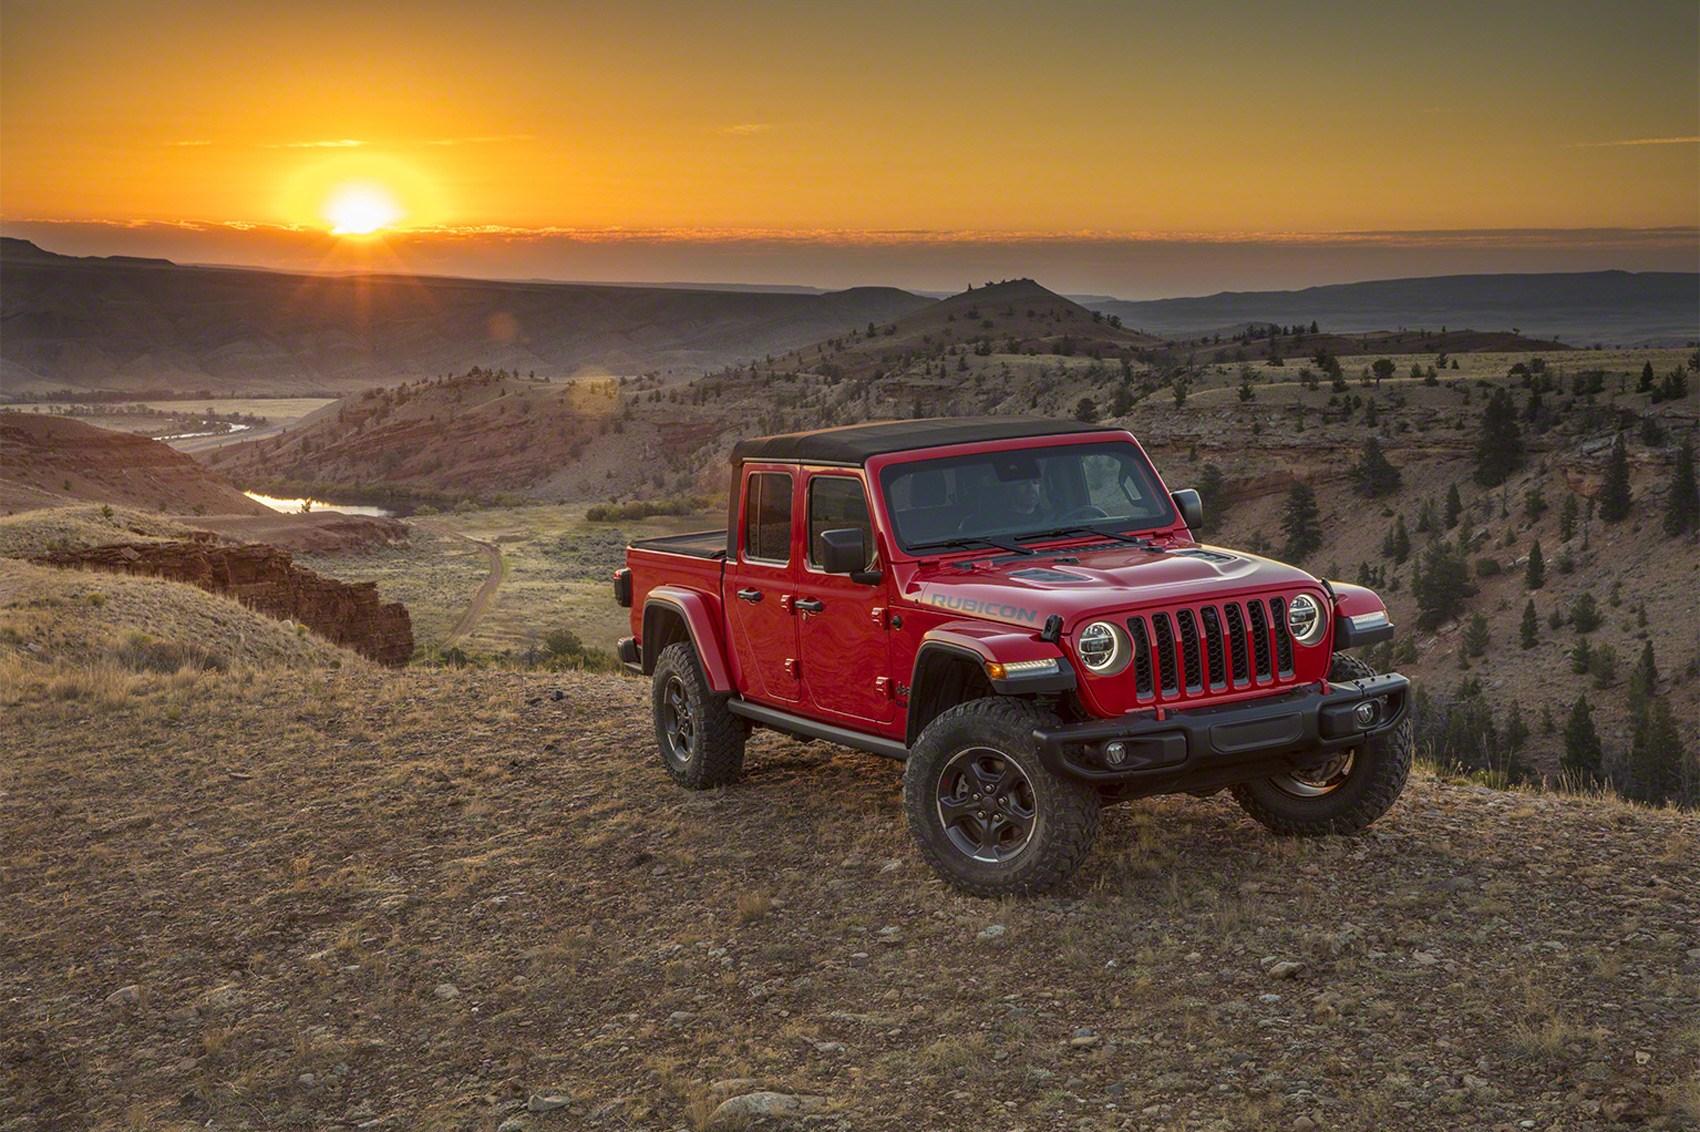 Jeep Wrangler Seat Covers >> Gladiator, ready! New 2020 Jeep Gladiator pickup arrives in LA | CAR Magazine